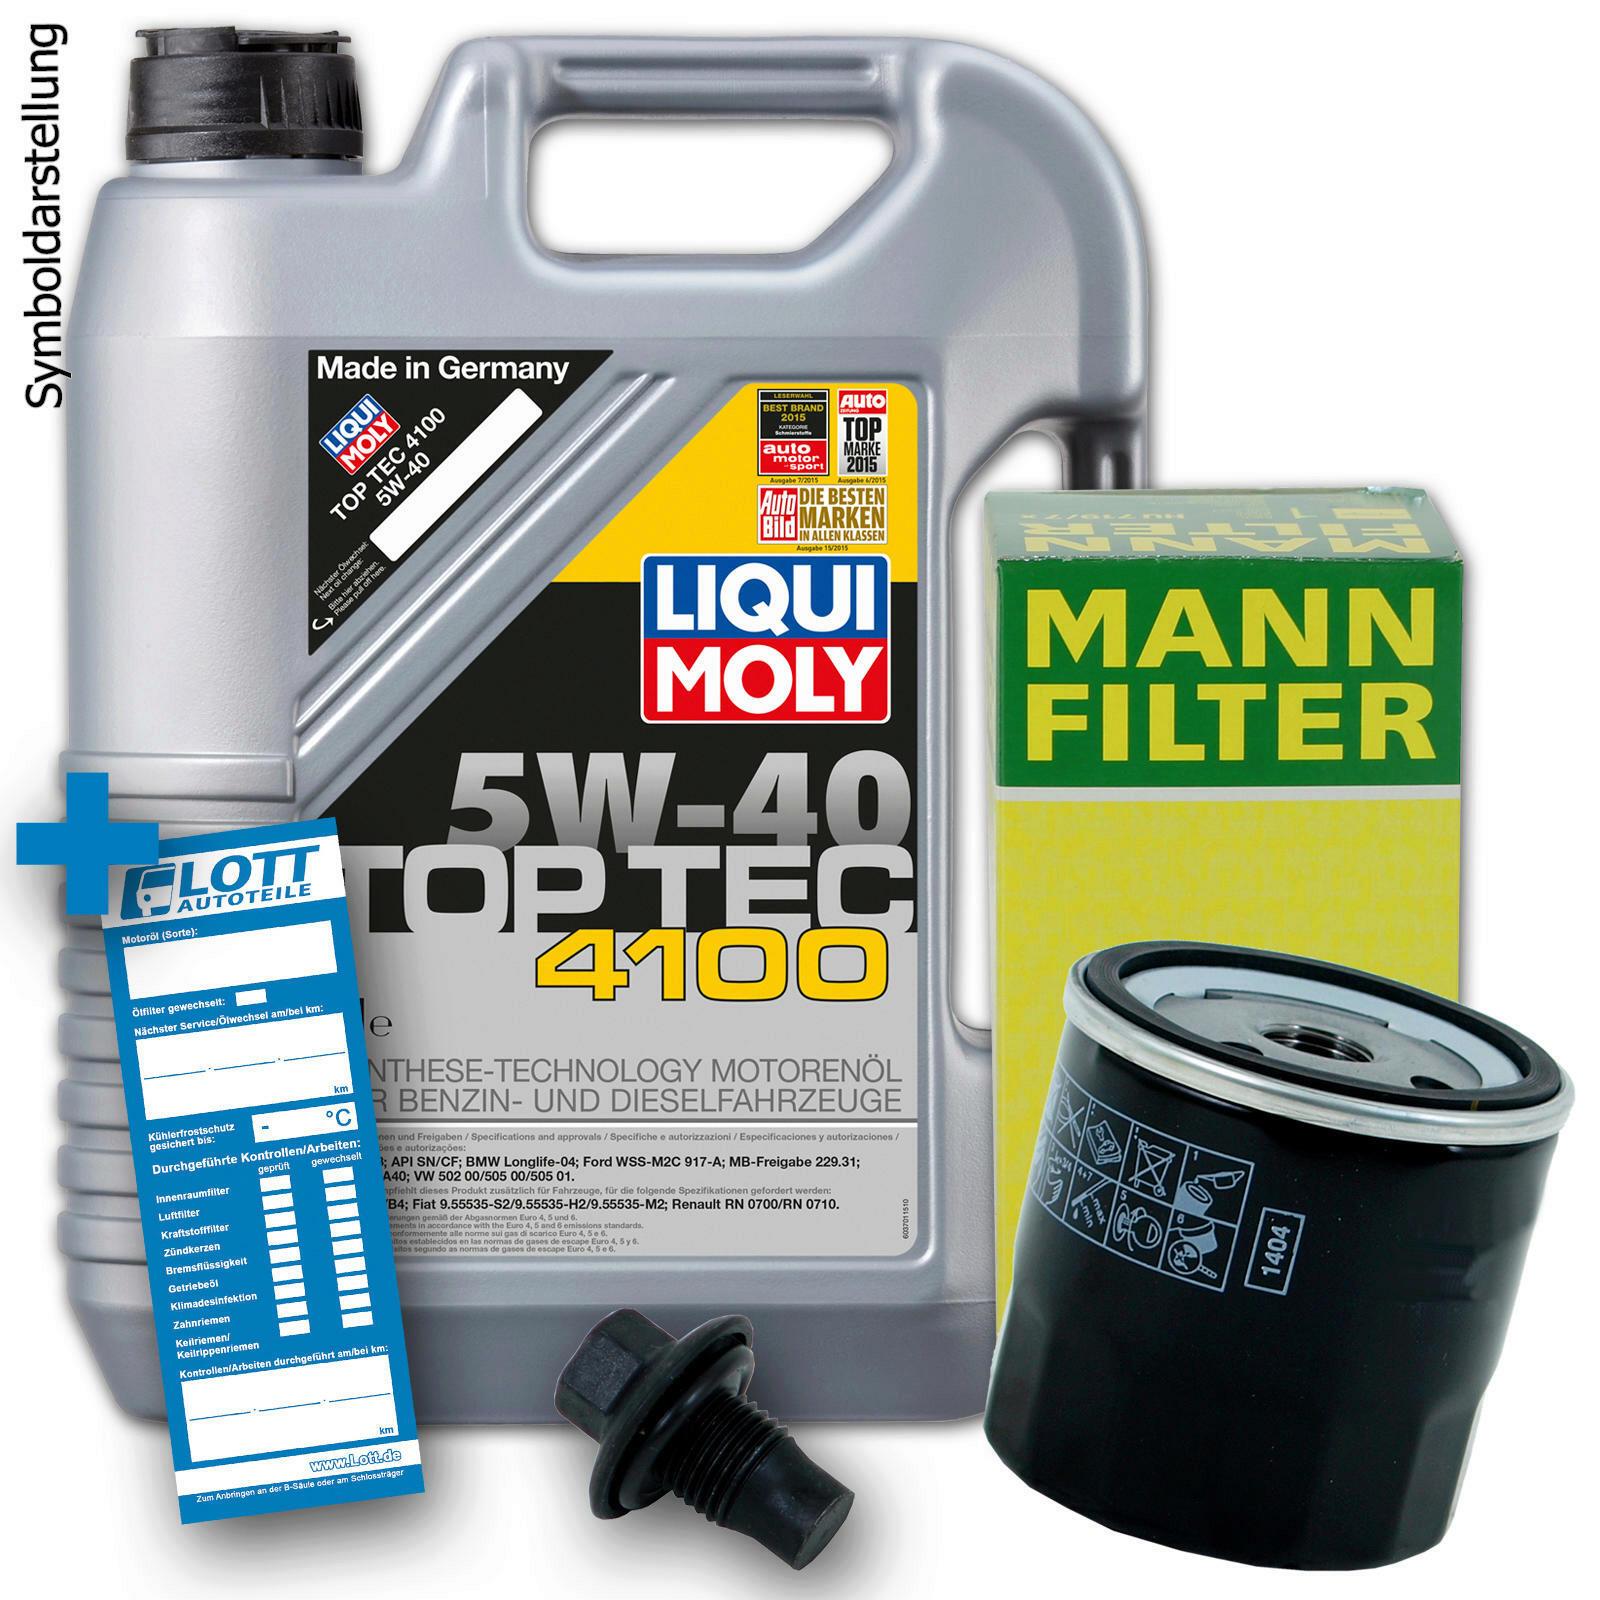 Ölwechsel Set 5L 5W40 Öl Motoröl LIQUI MOLY + MANN Ölfilter